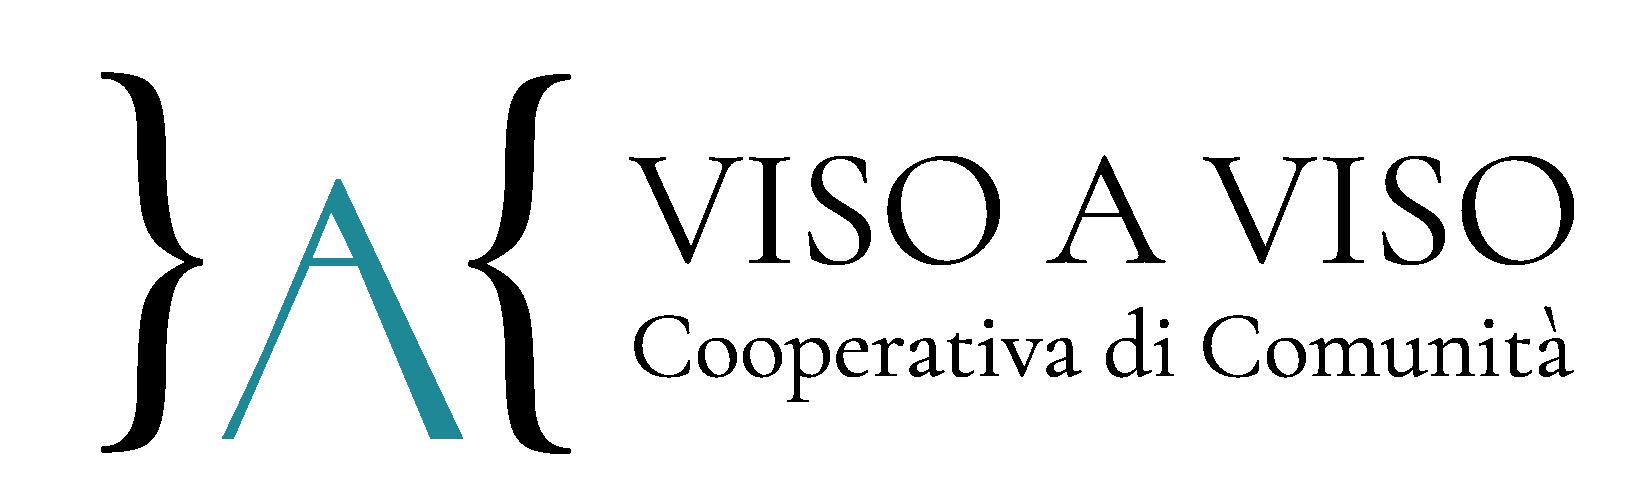 VAV_studio_logo_DEF (1)-01